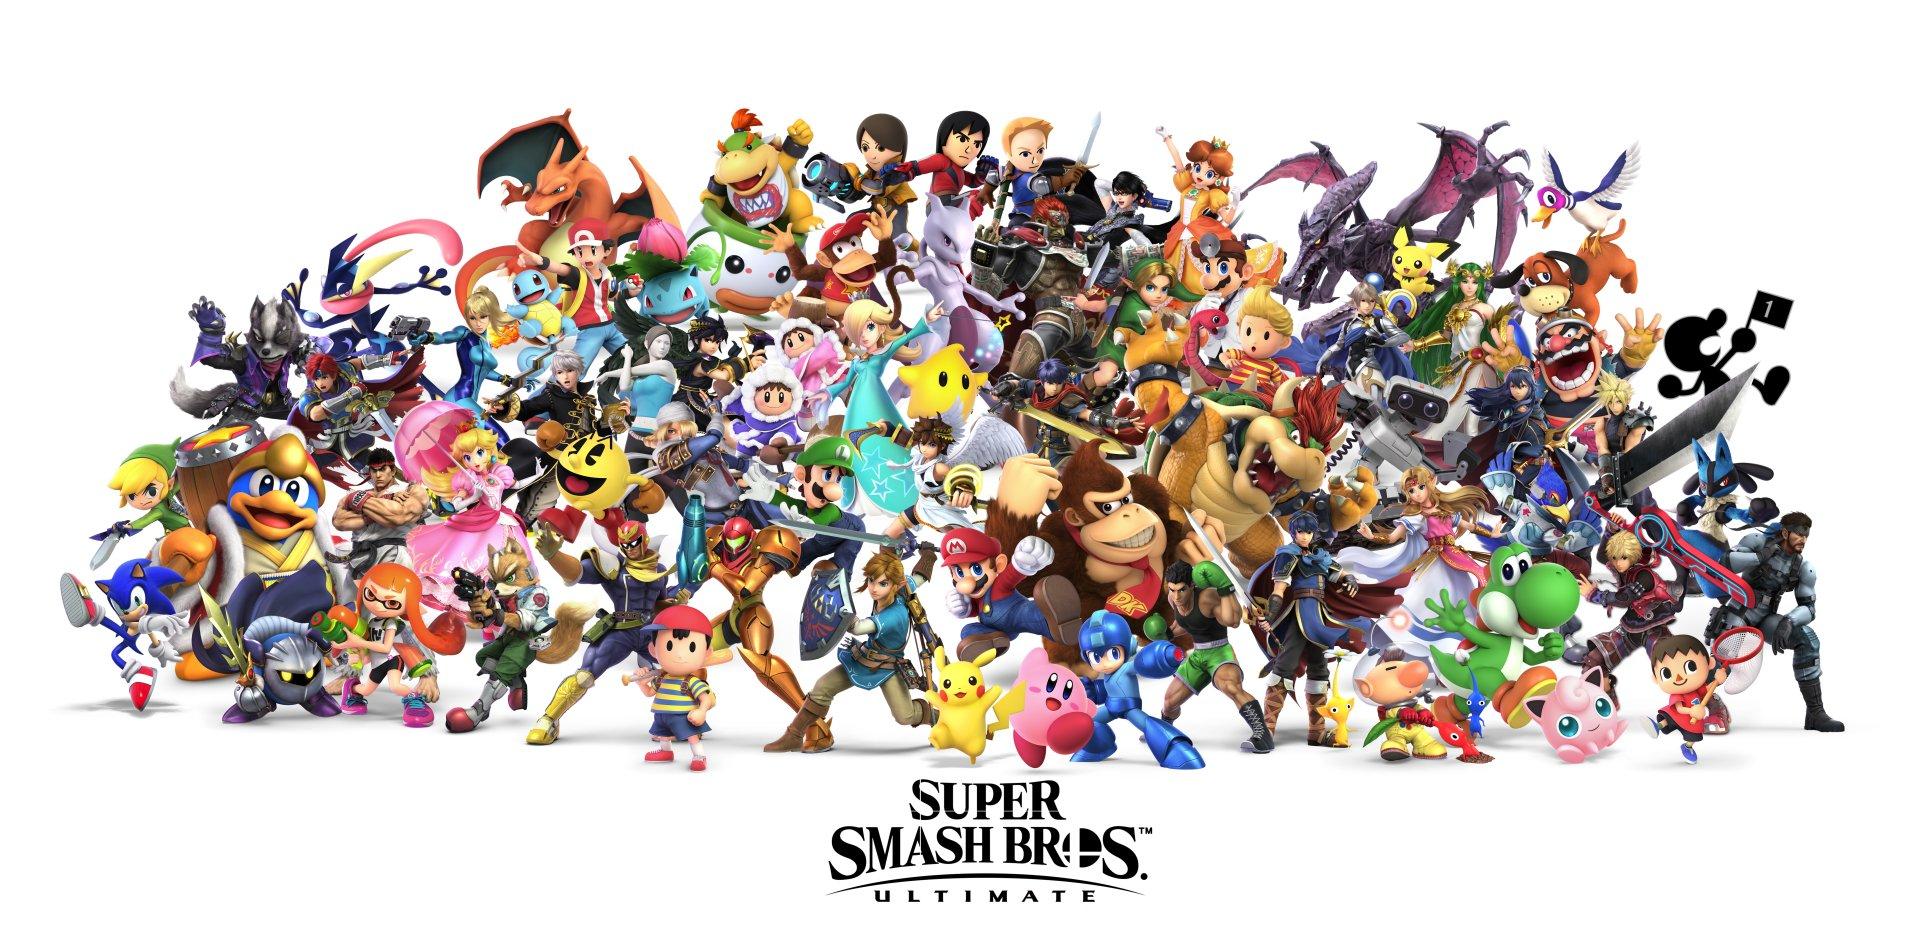 Super Smash Bros. Ultimate 8k Ultra HD Wallpaper ...